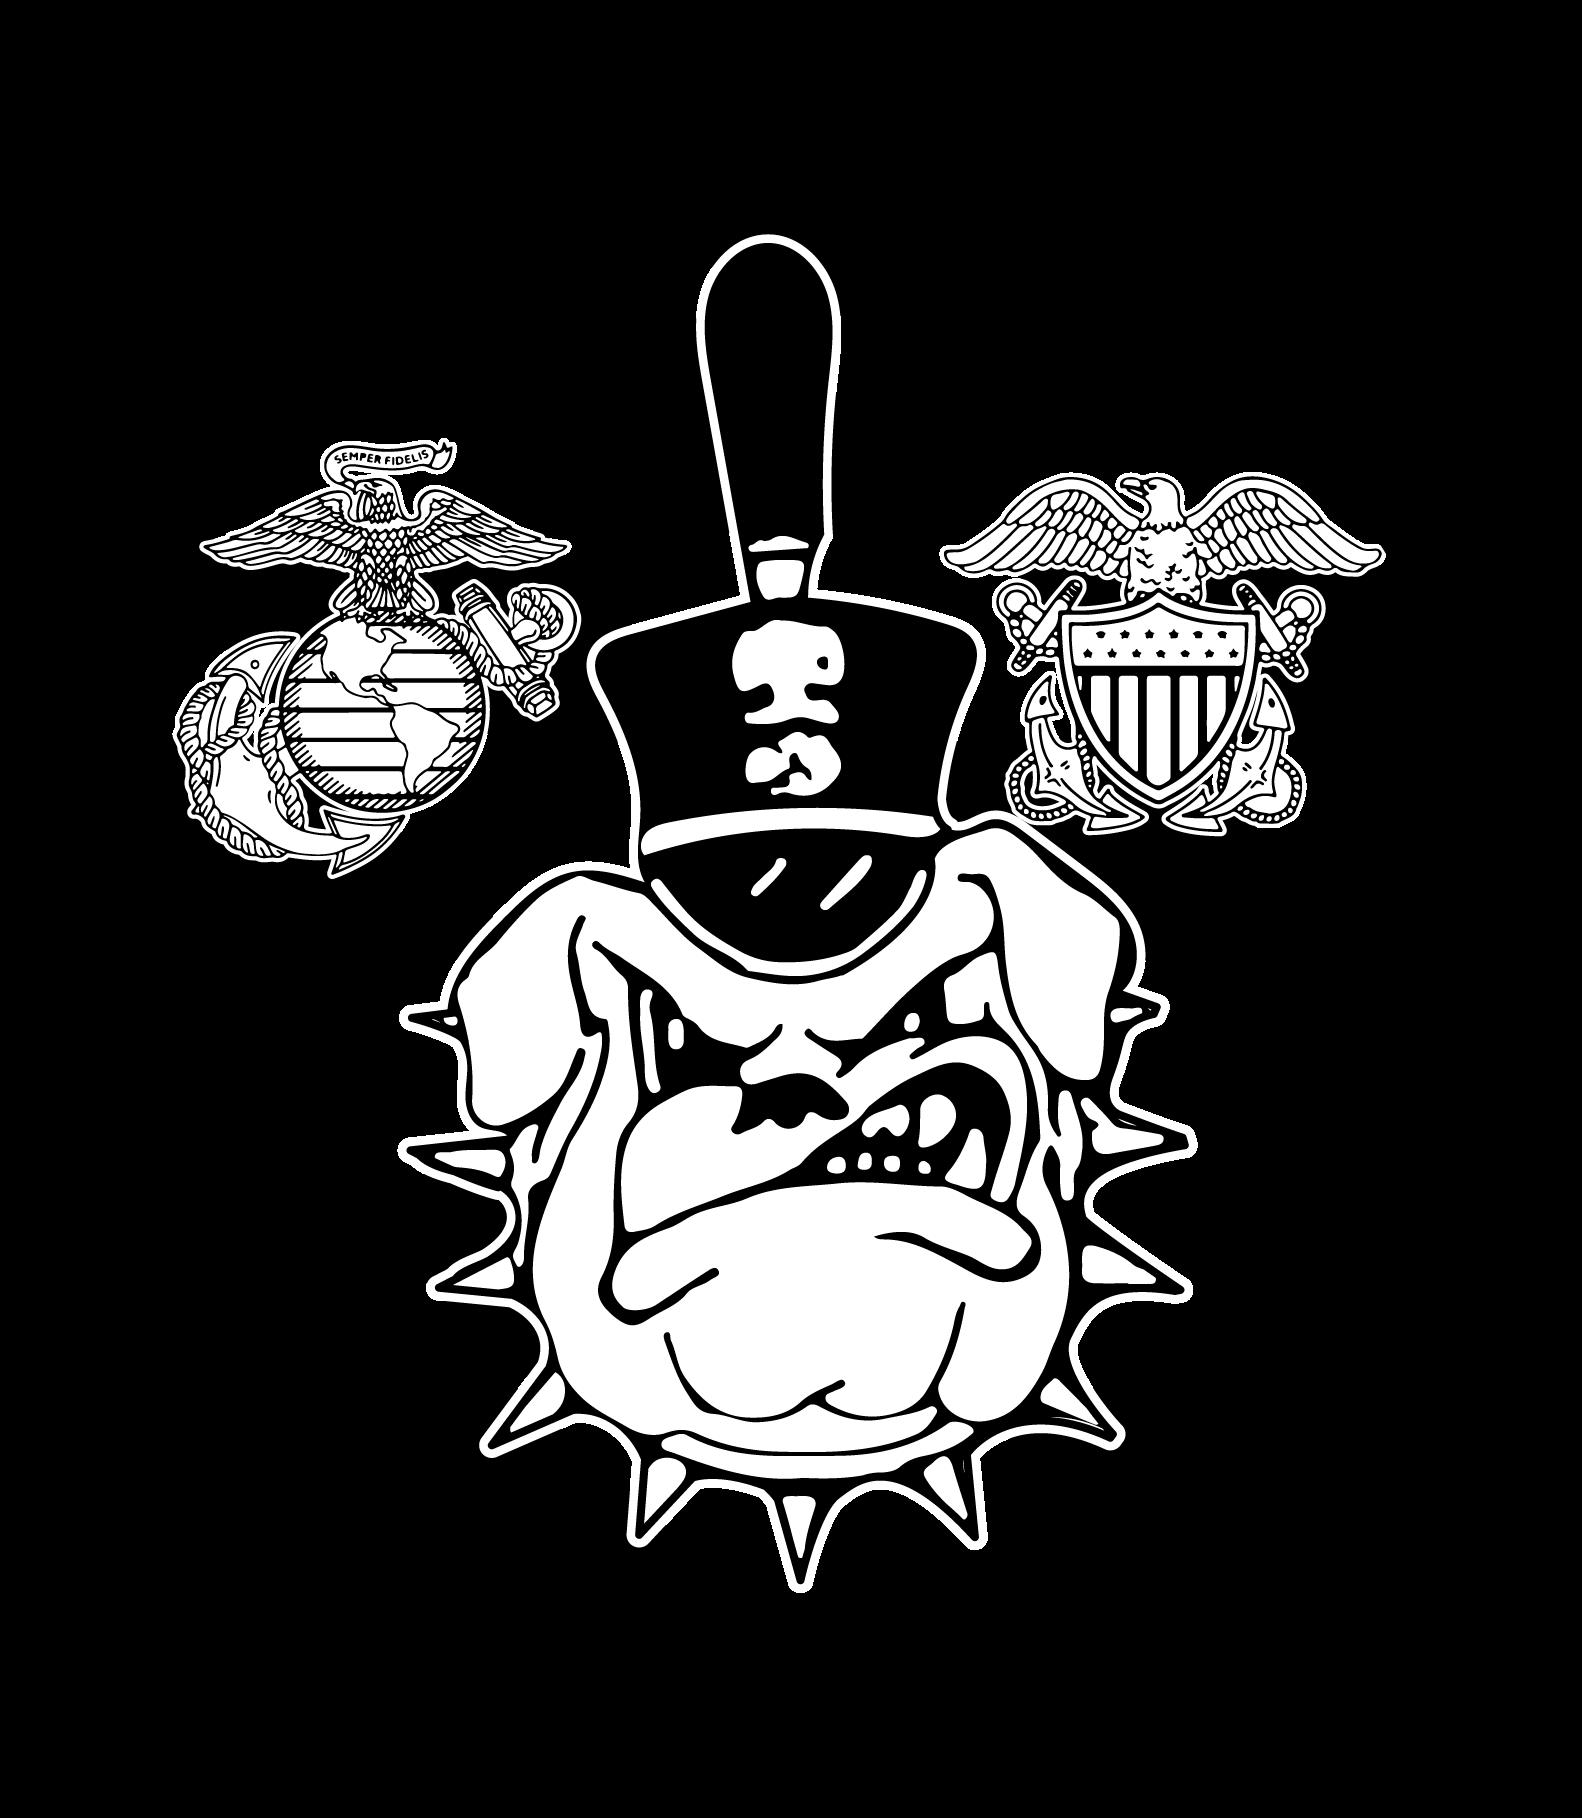 Citadel cadet clipart svg freeuse download Naval ROTC Unit (NROTC) - The Citadel - Charleston, SC svg freeuse download